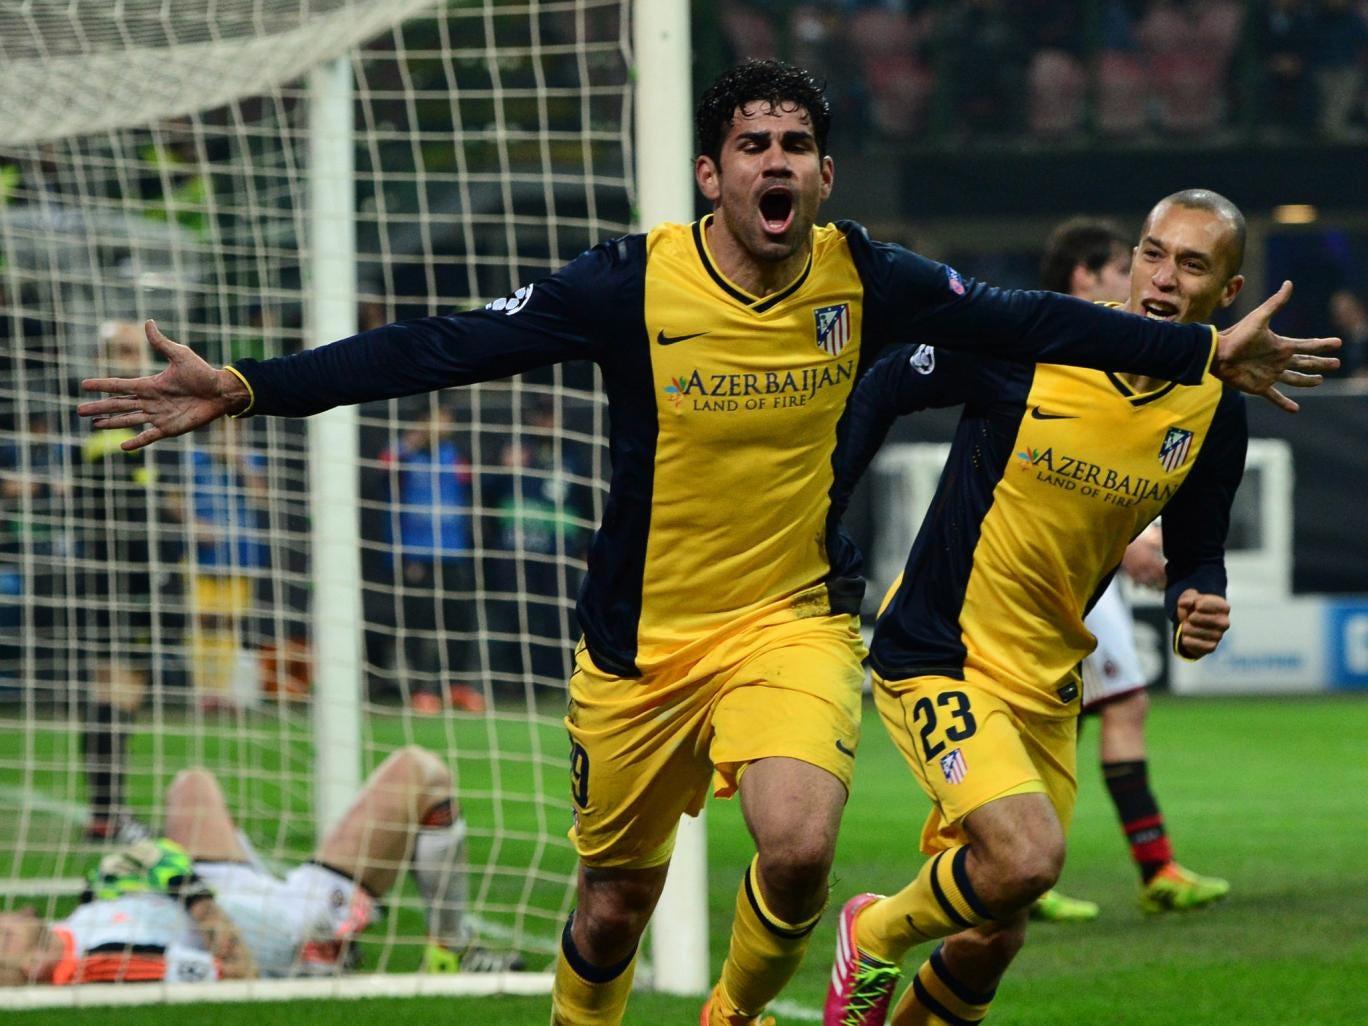 Diego Costa of Altetico Madrid celebrates scoring a Champions League goal against AC Milan